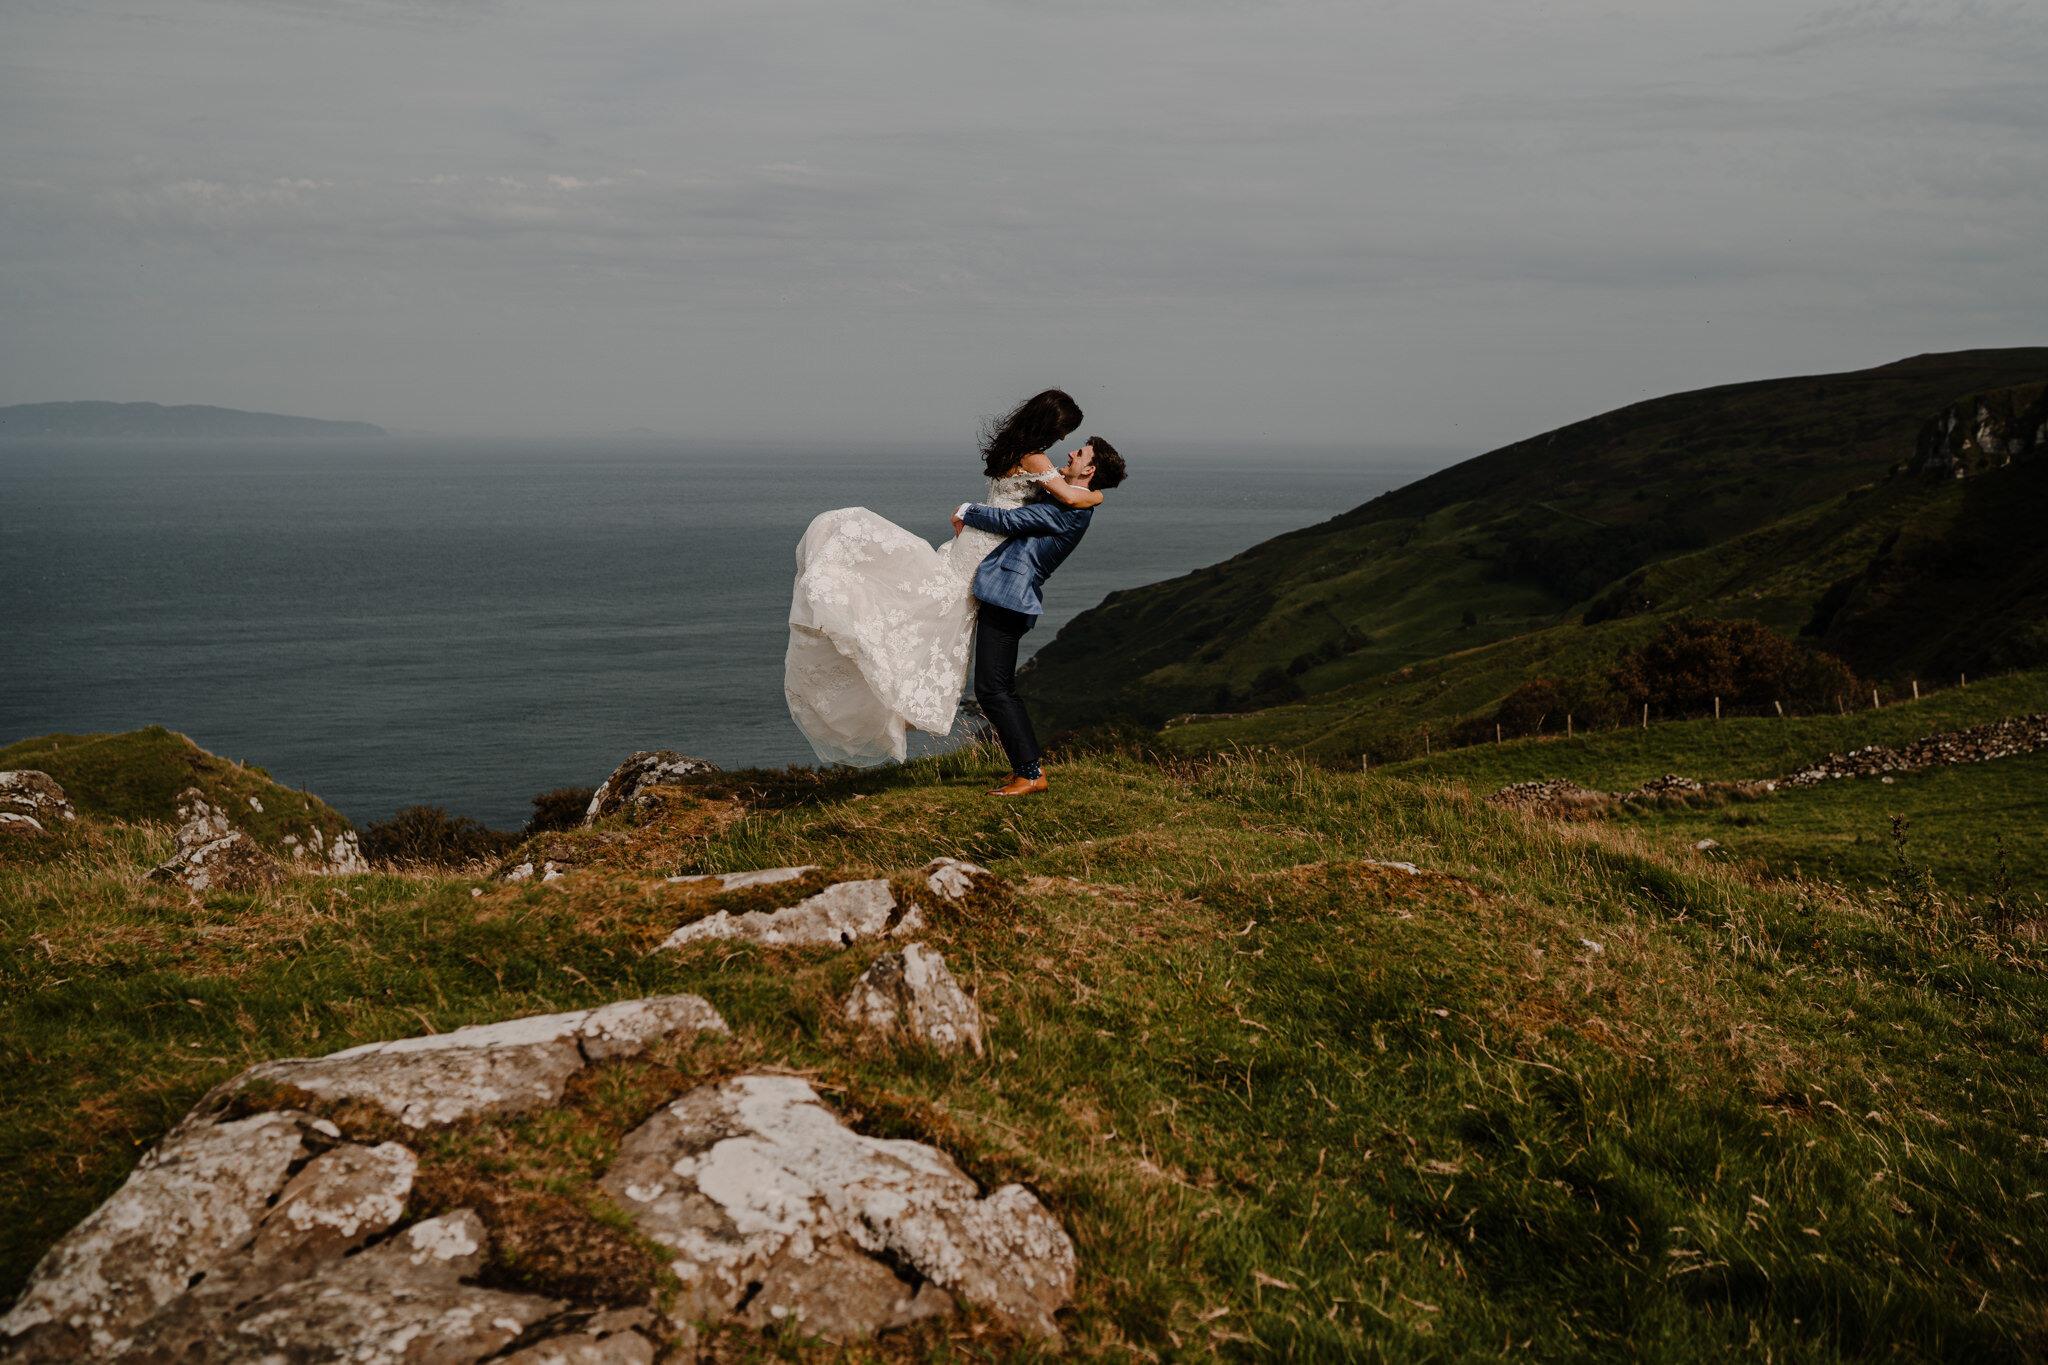 romantic couple notebook lift murlough bay